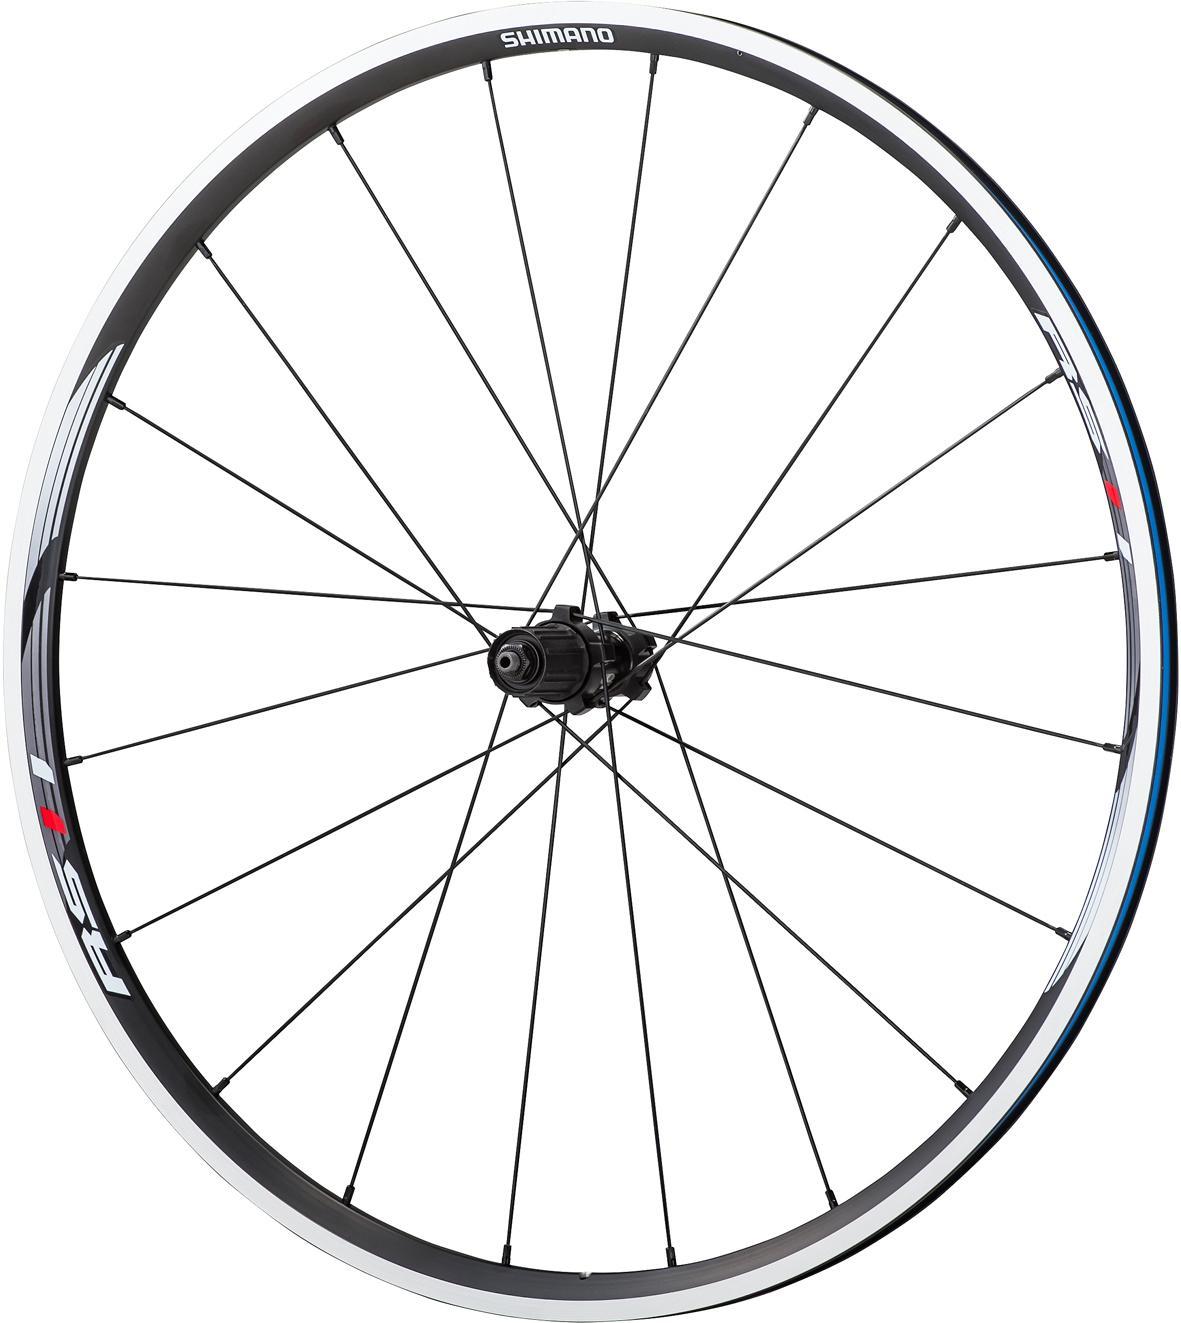 Shimano Rs11 Rear Wheel 9 10 11 Speed 24mm High Profile